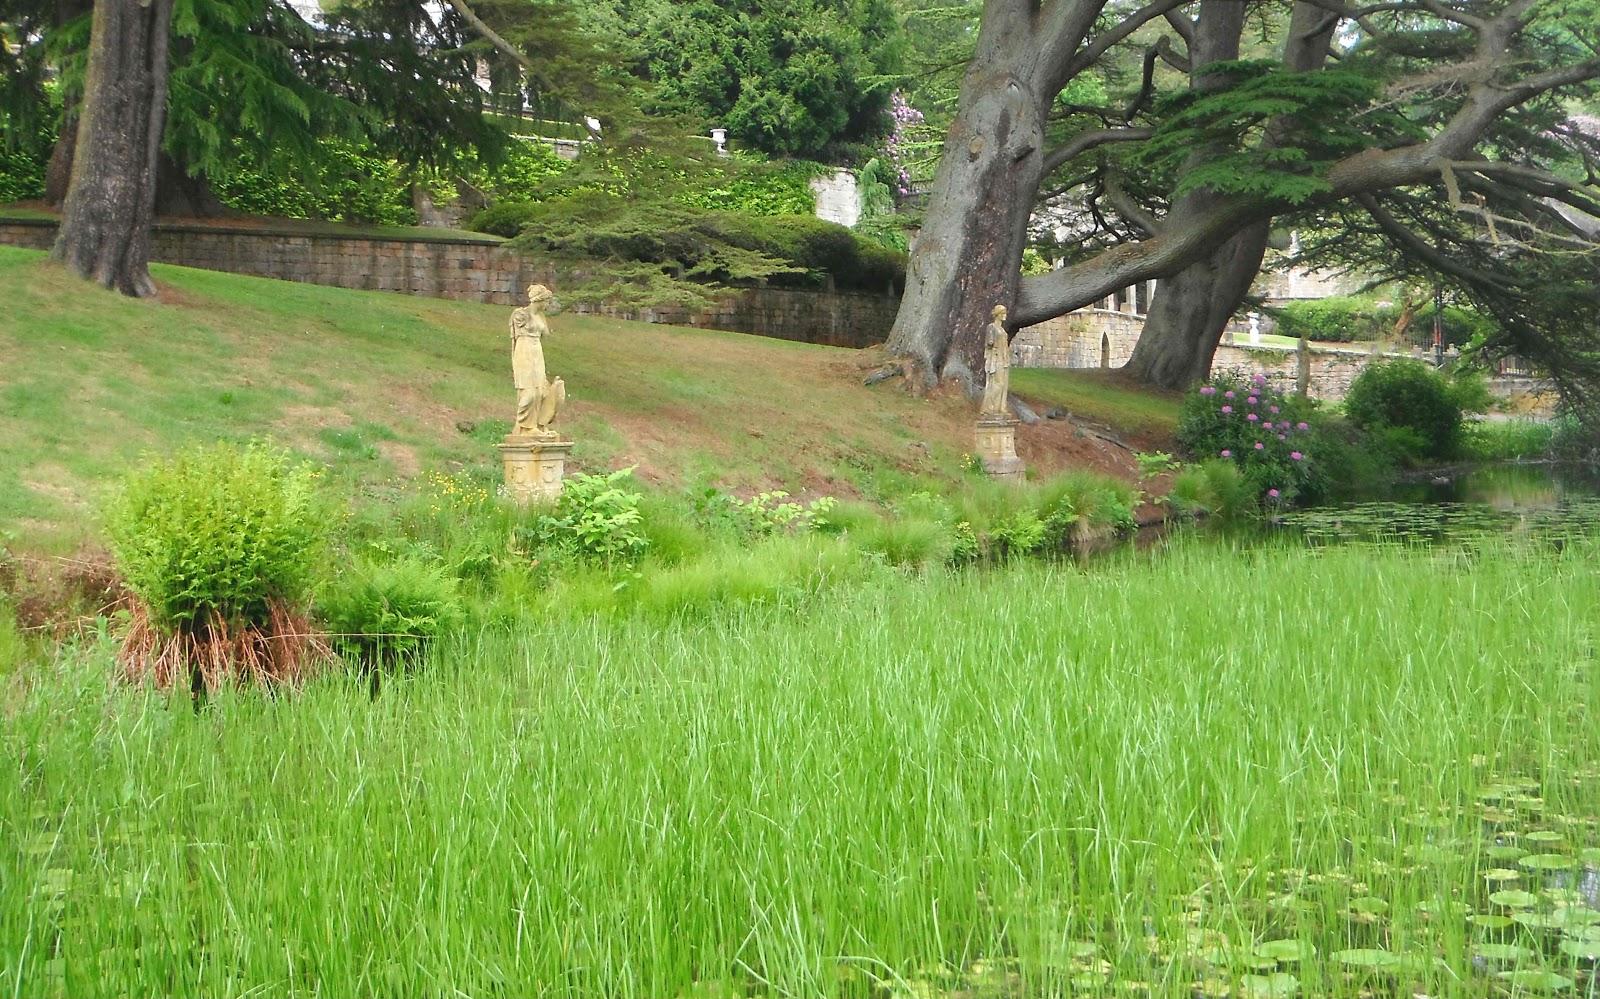 The gardens of Alton Towers